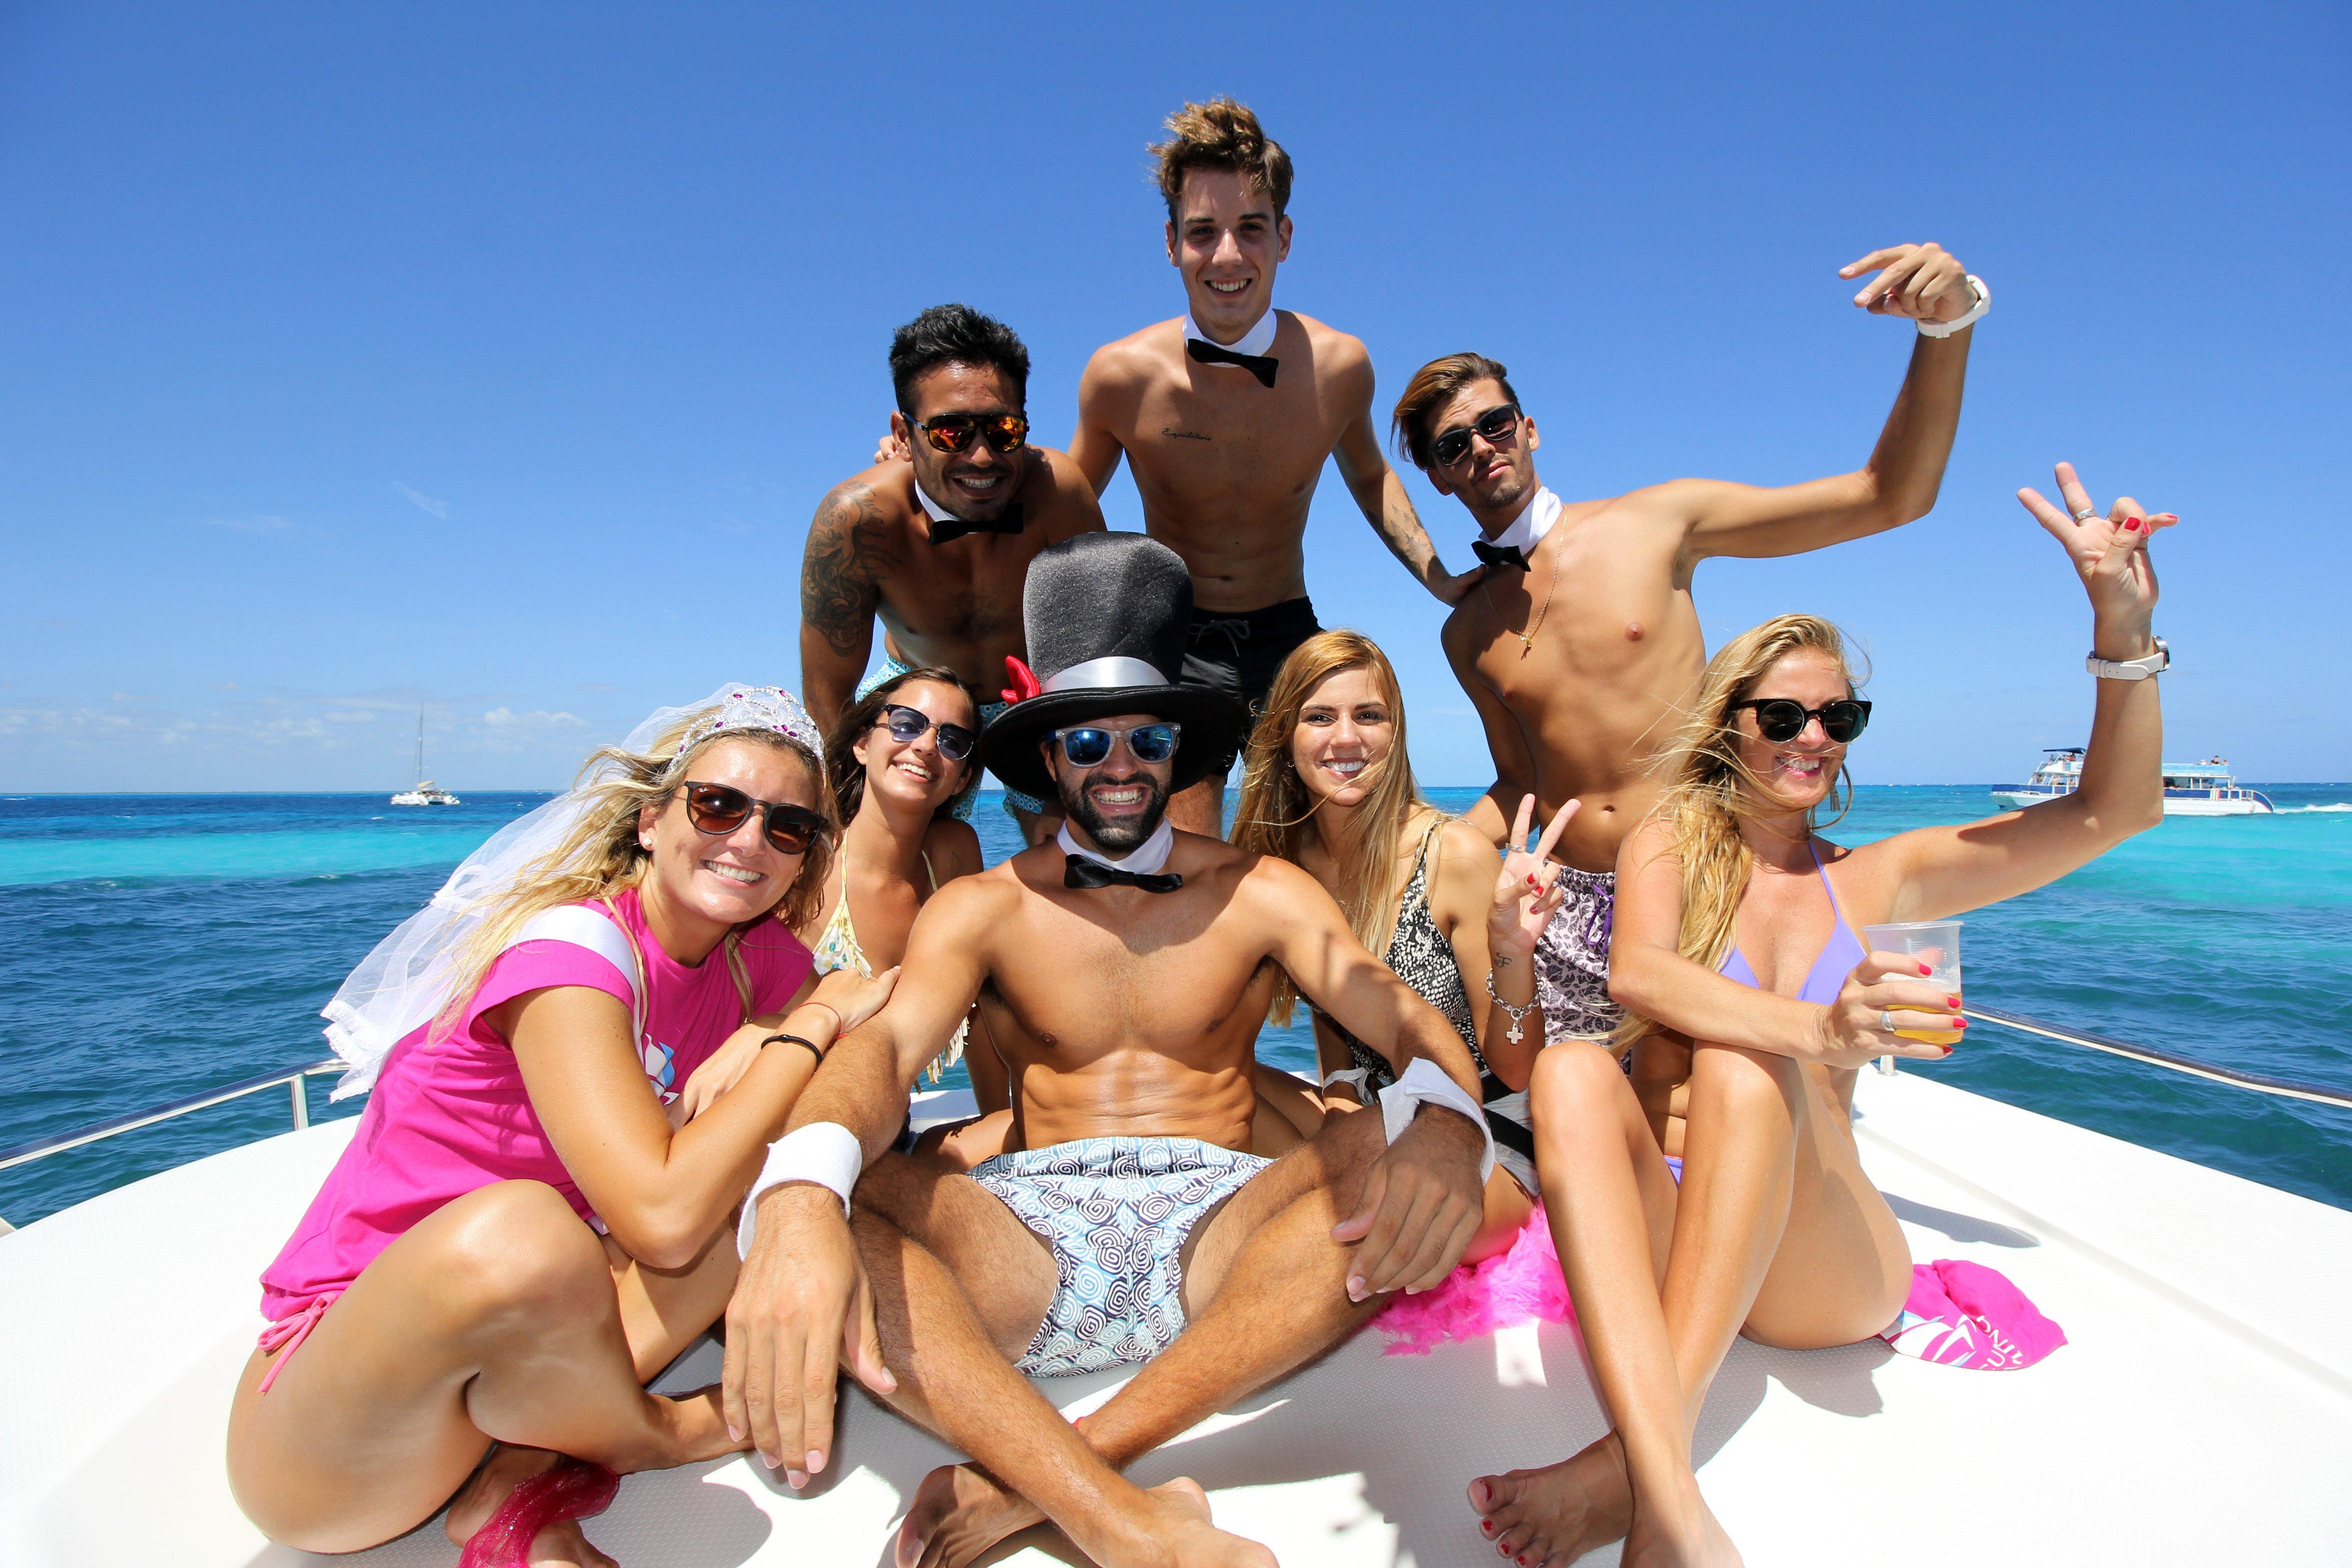 cancun bachelorette party in catamaran - isla mujeres - 15